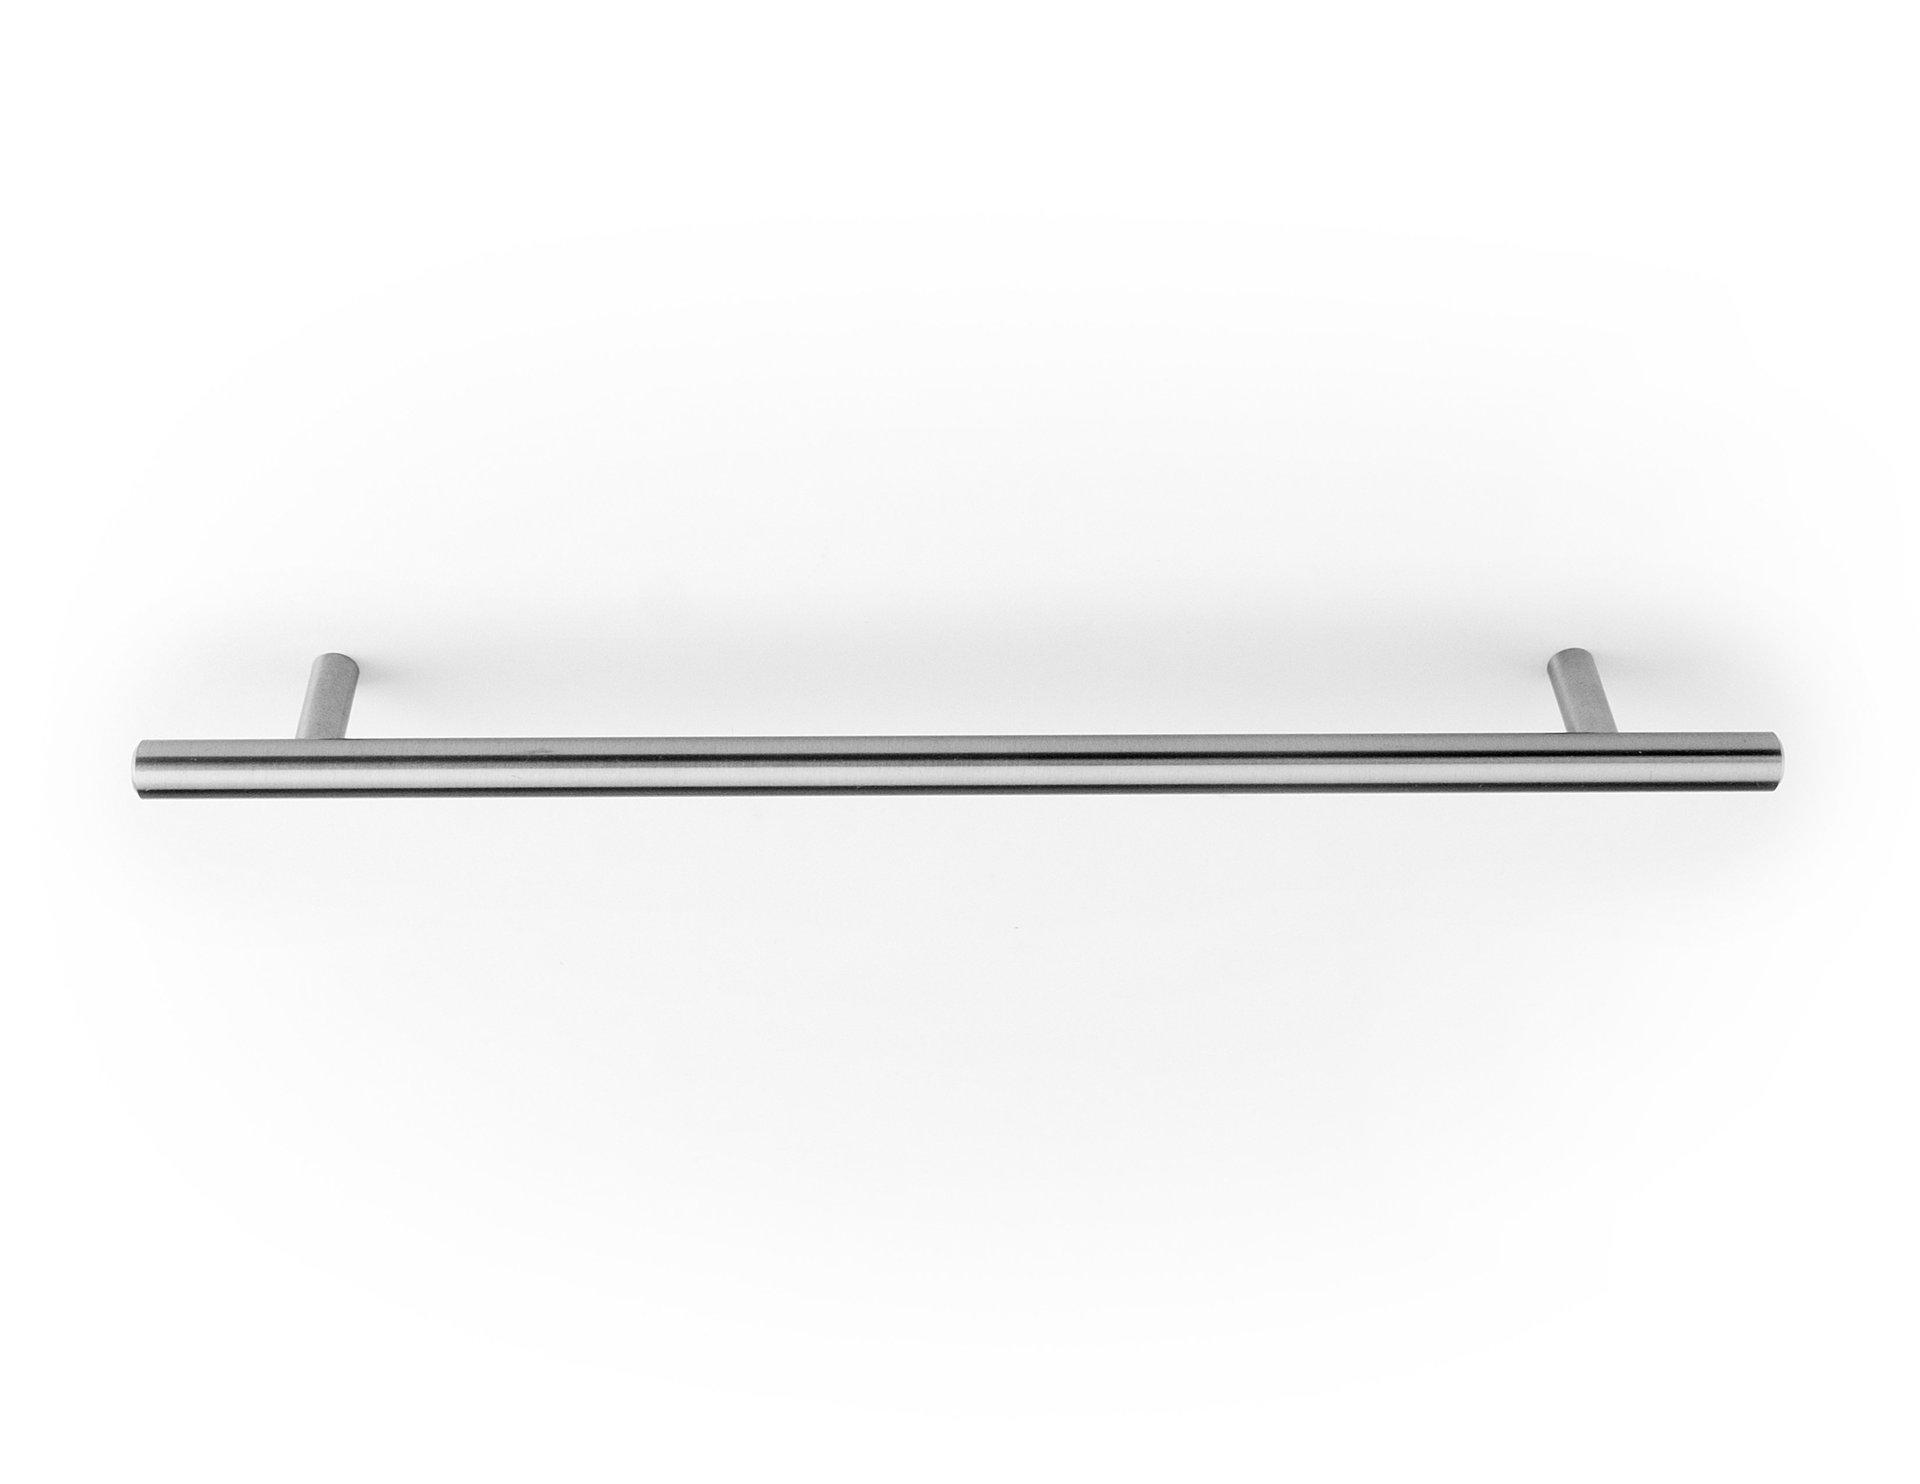 456mm Brushed Nickel Bar Handle